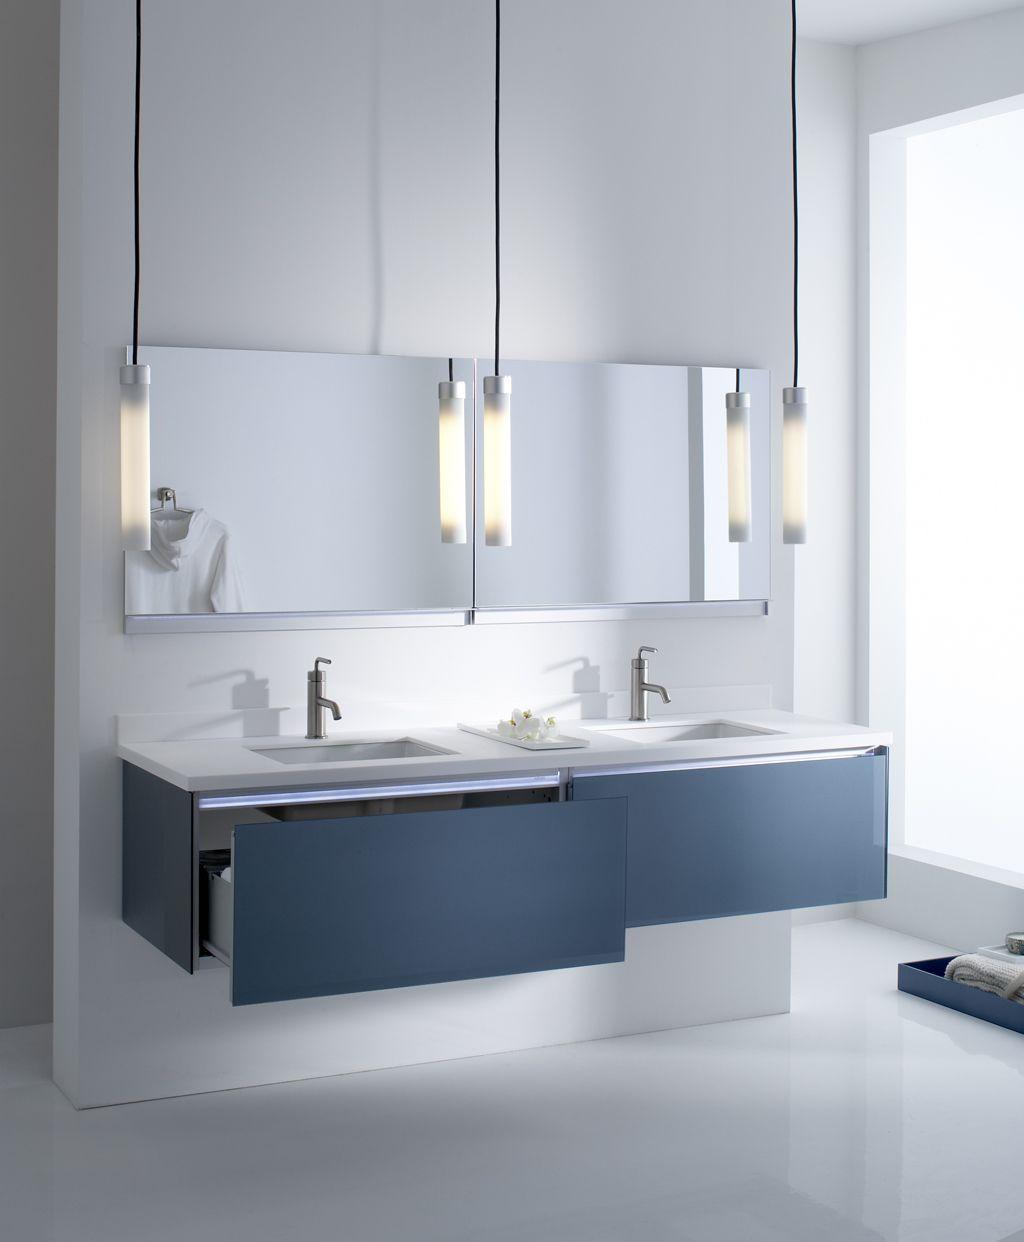 floating bathroom cabinets   sunshine canyon   Pinterest   Bathroom ...